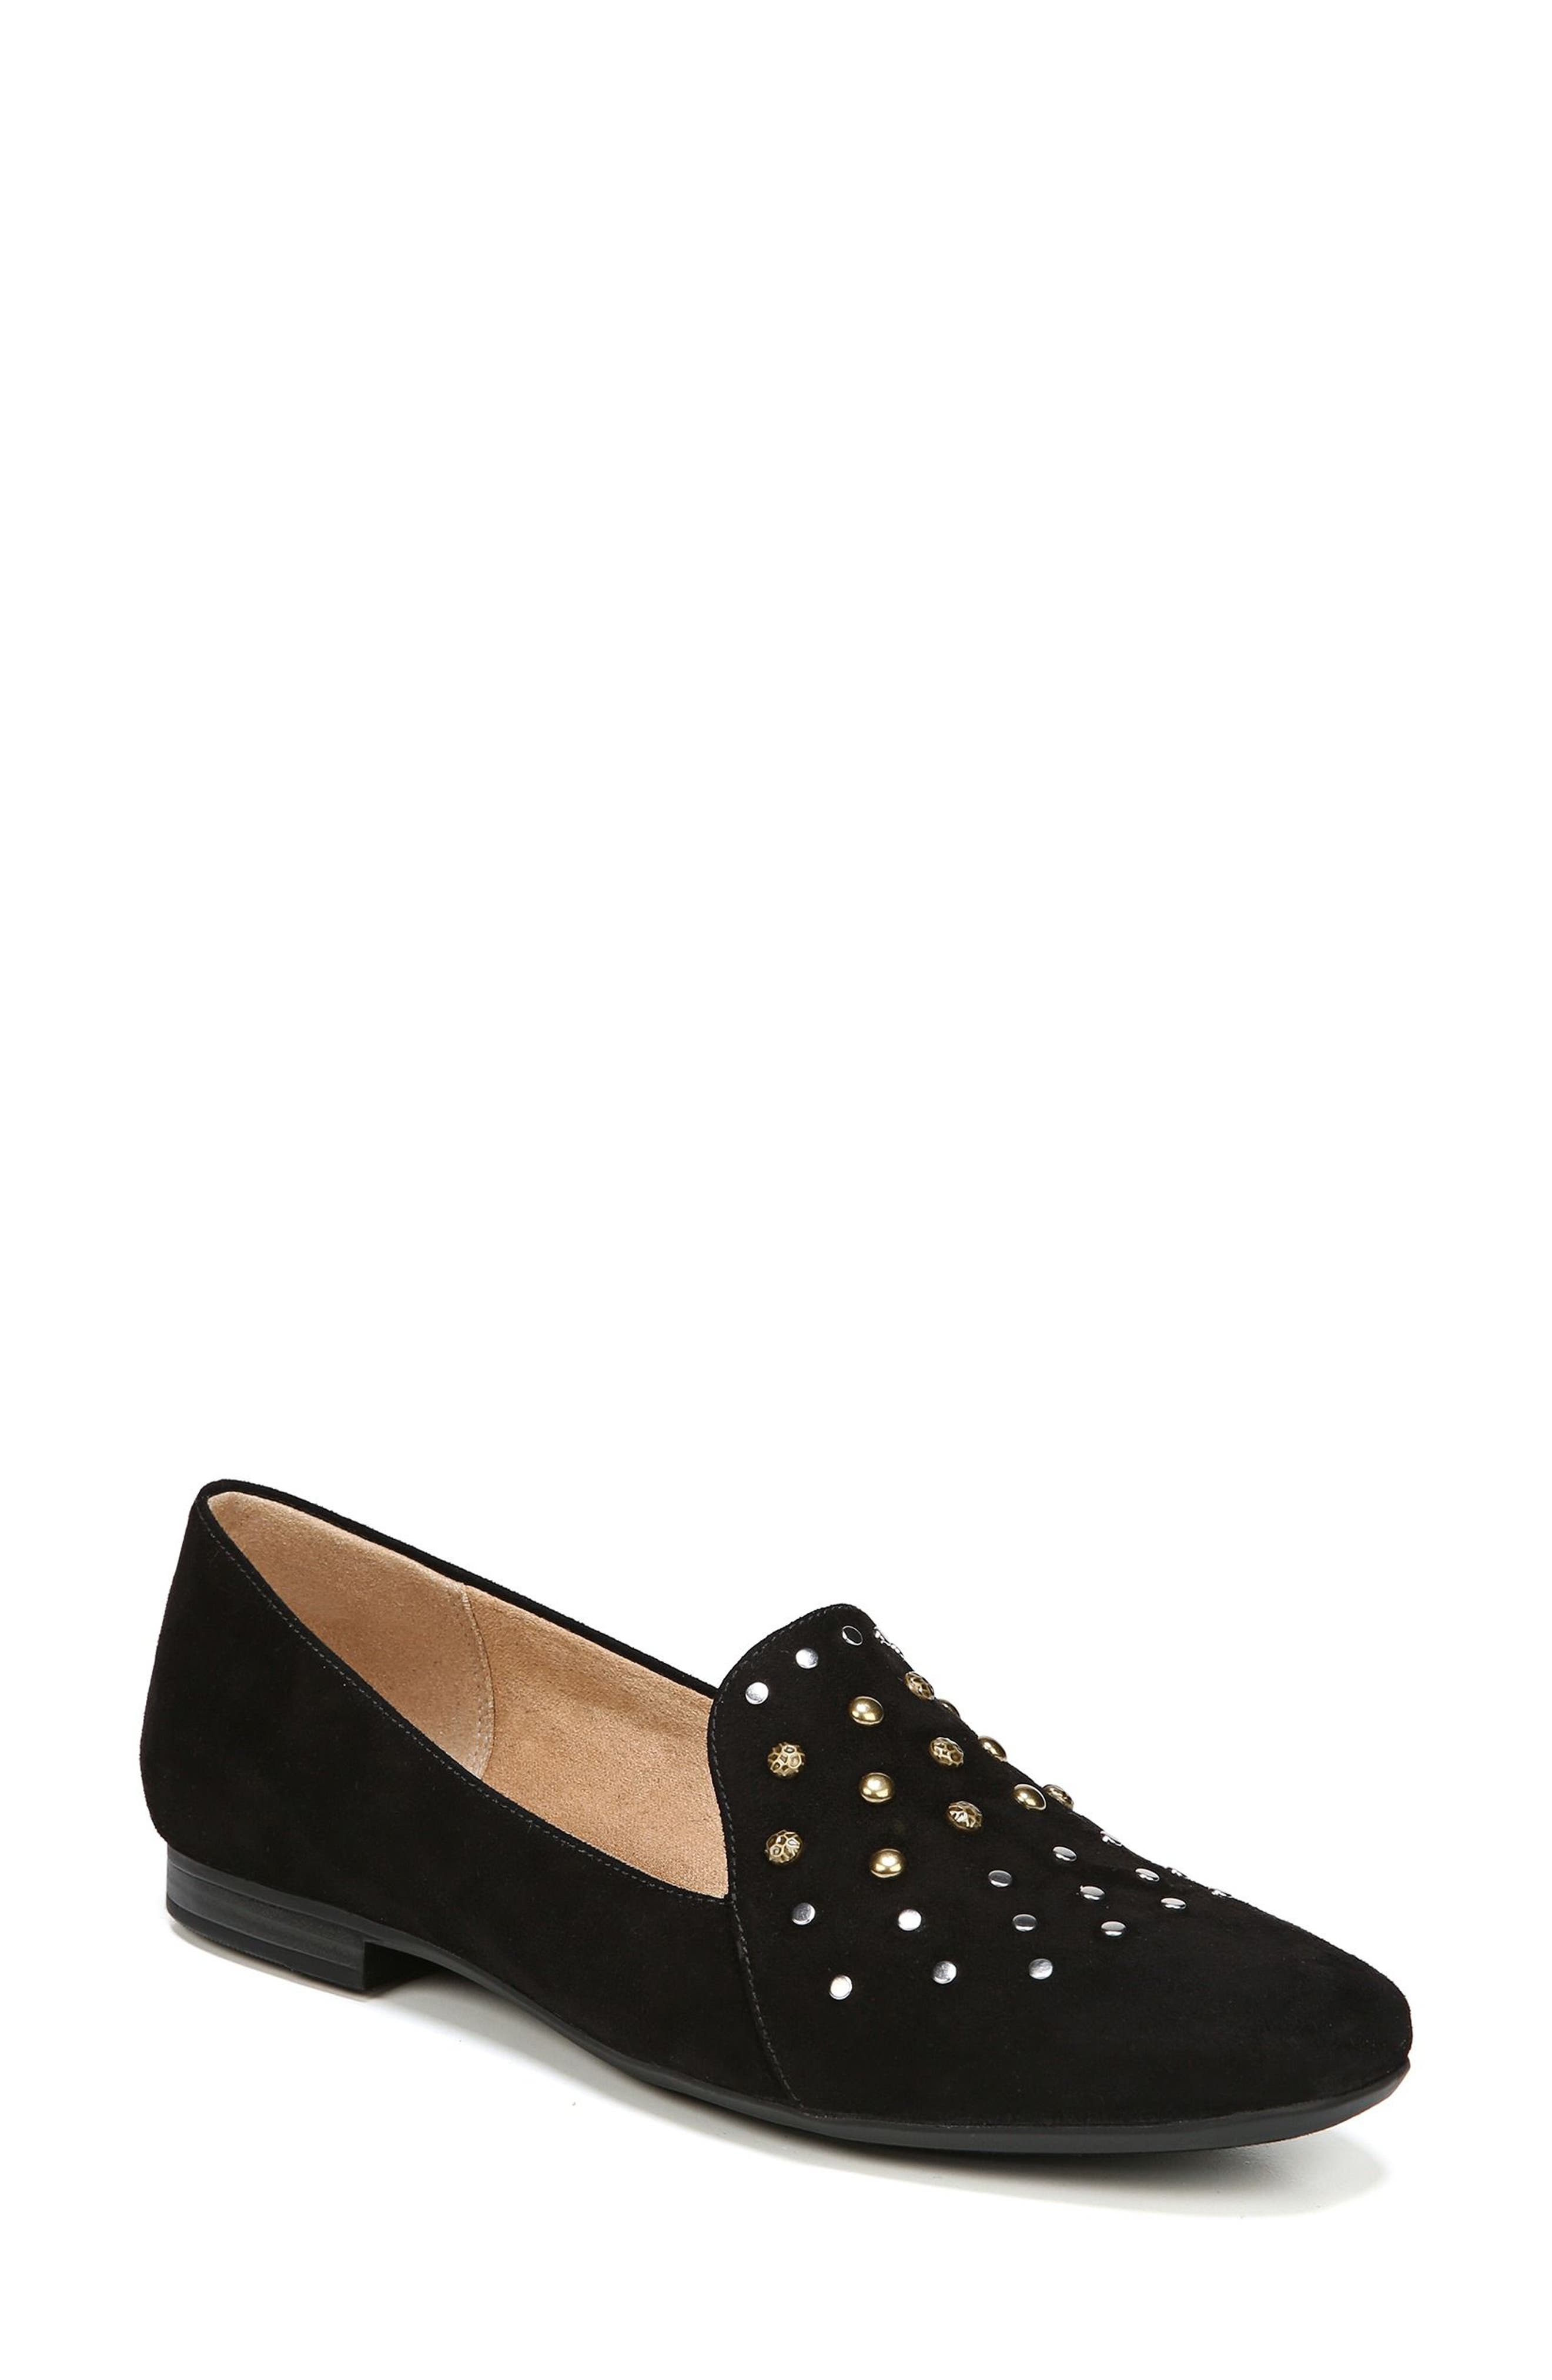 Emiline 4 Loafer,                             Main thumbnail 1, color,                             Black Fabric